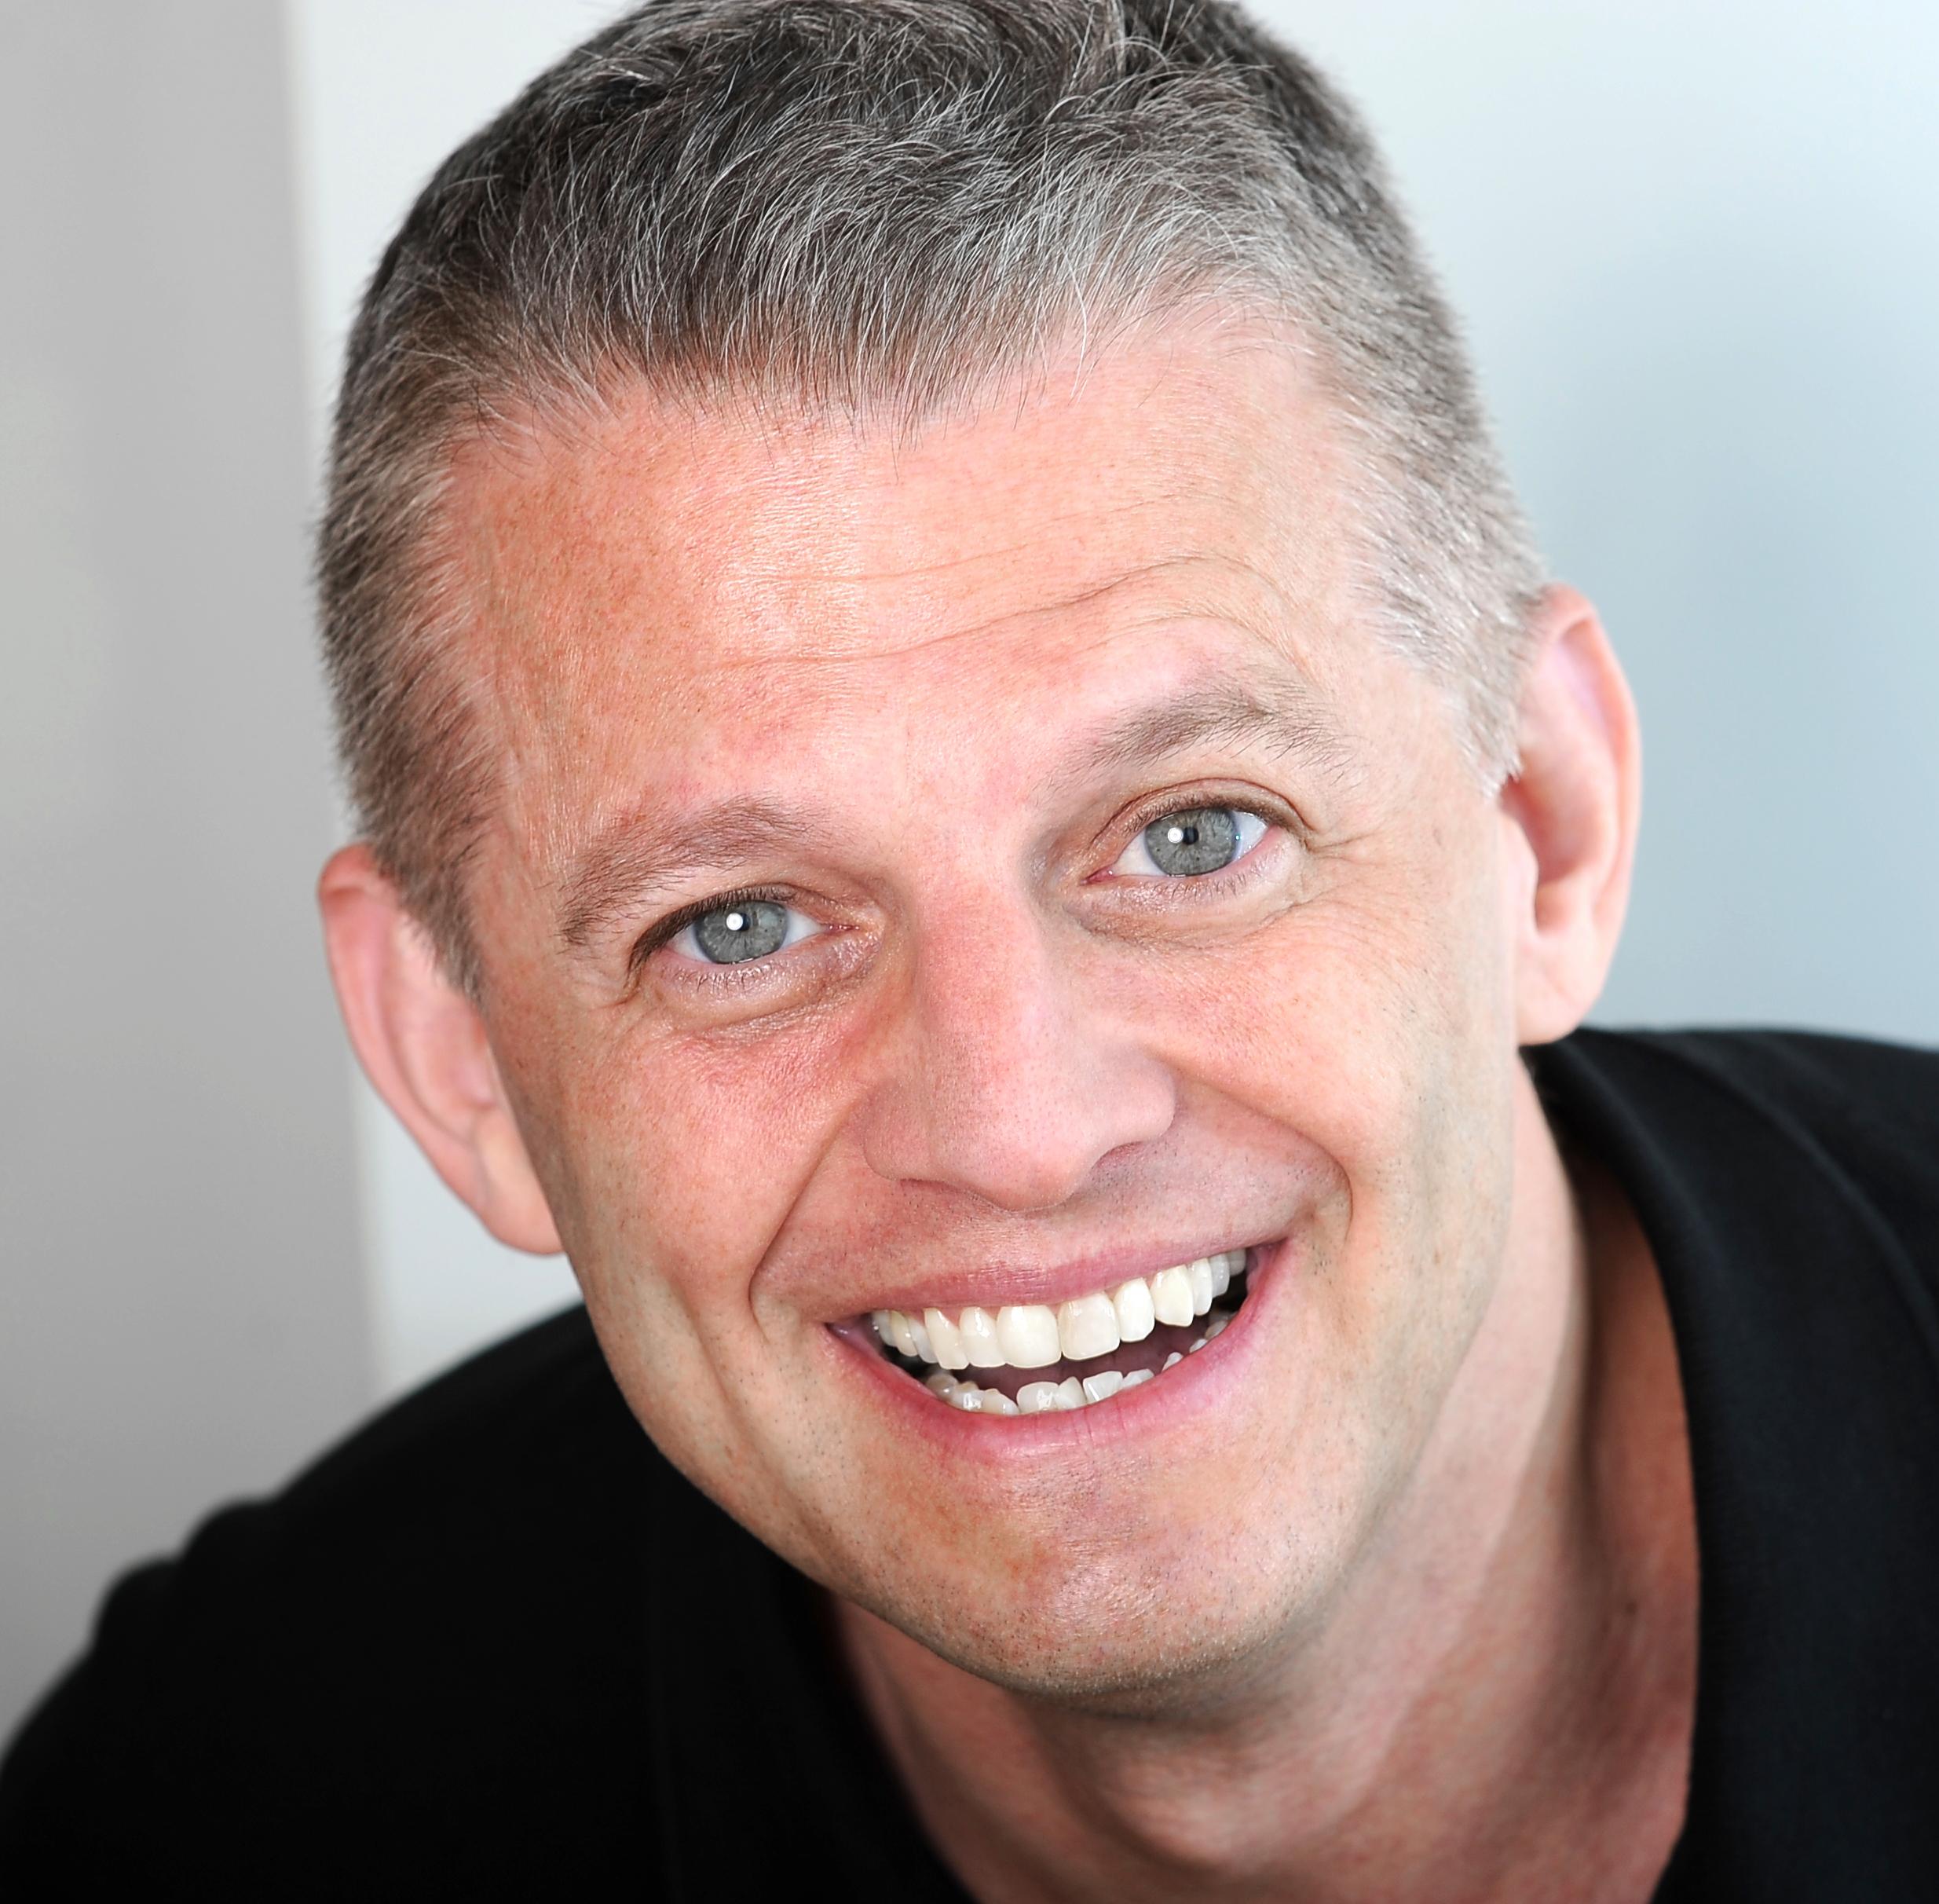 wilson-mcdermut-comedian-contact-pic.jpg